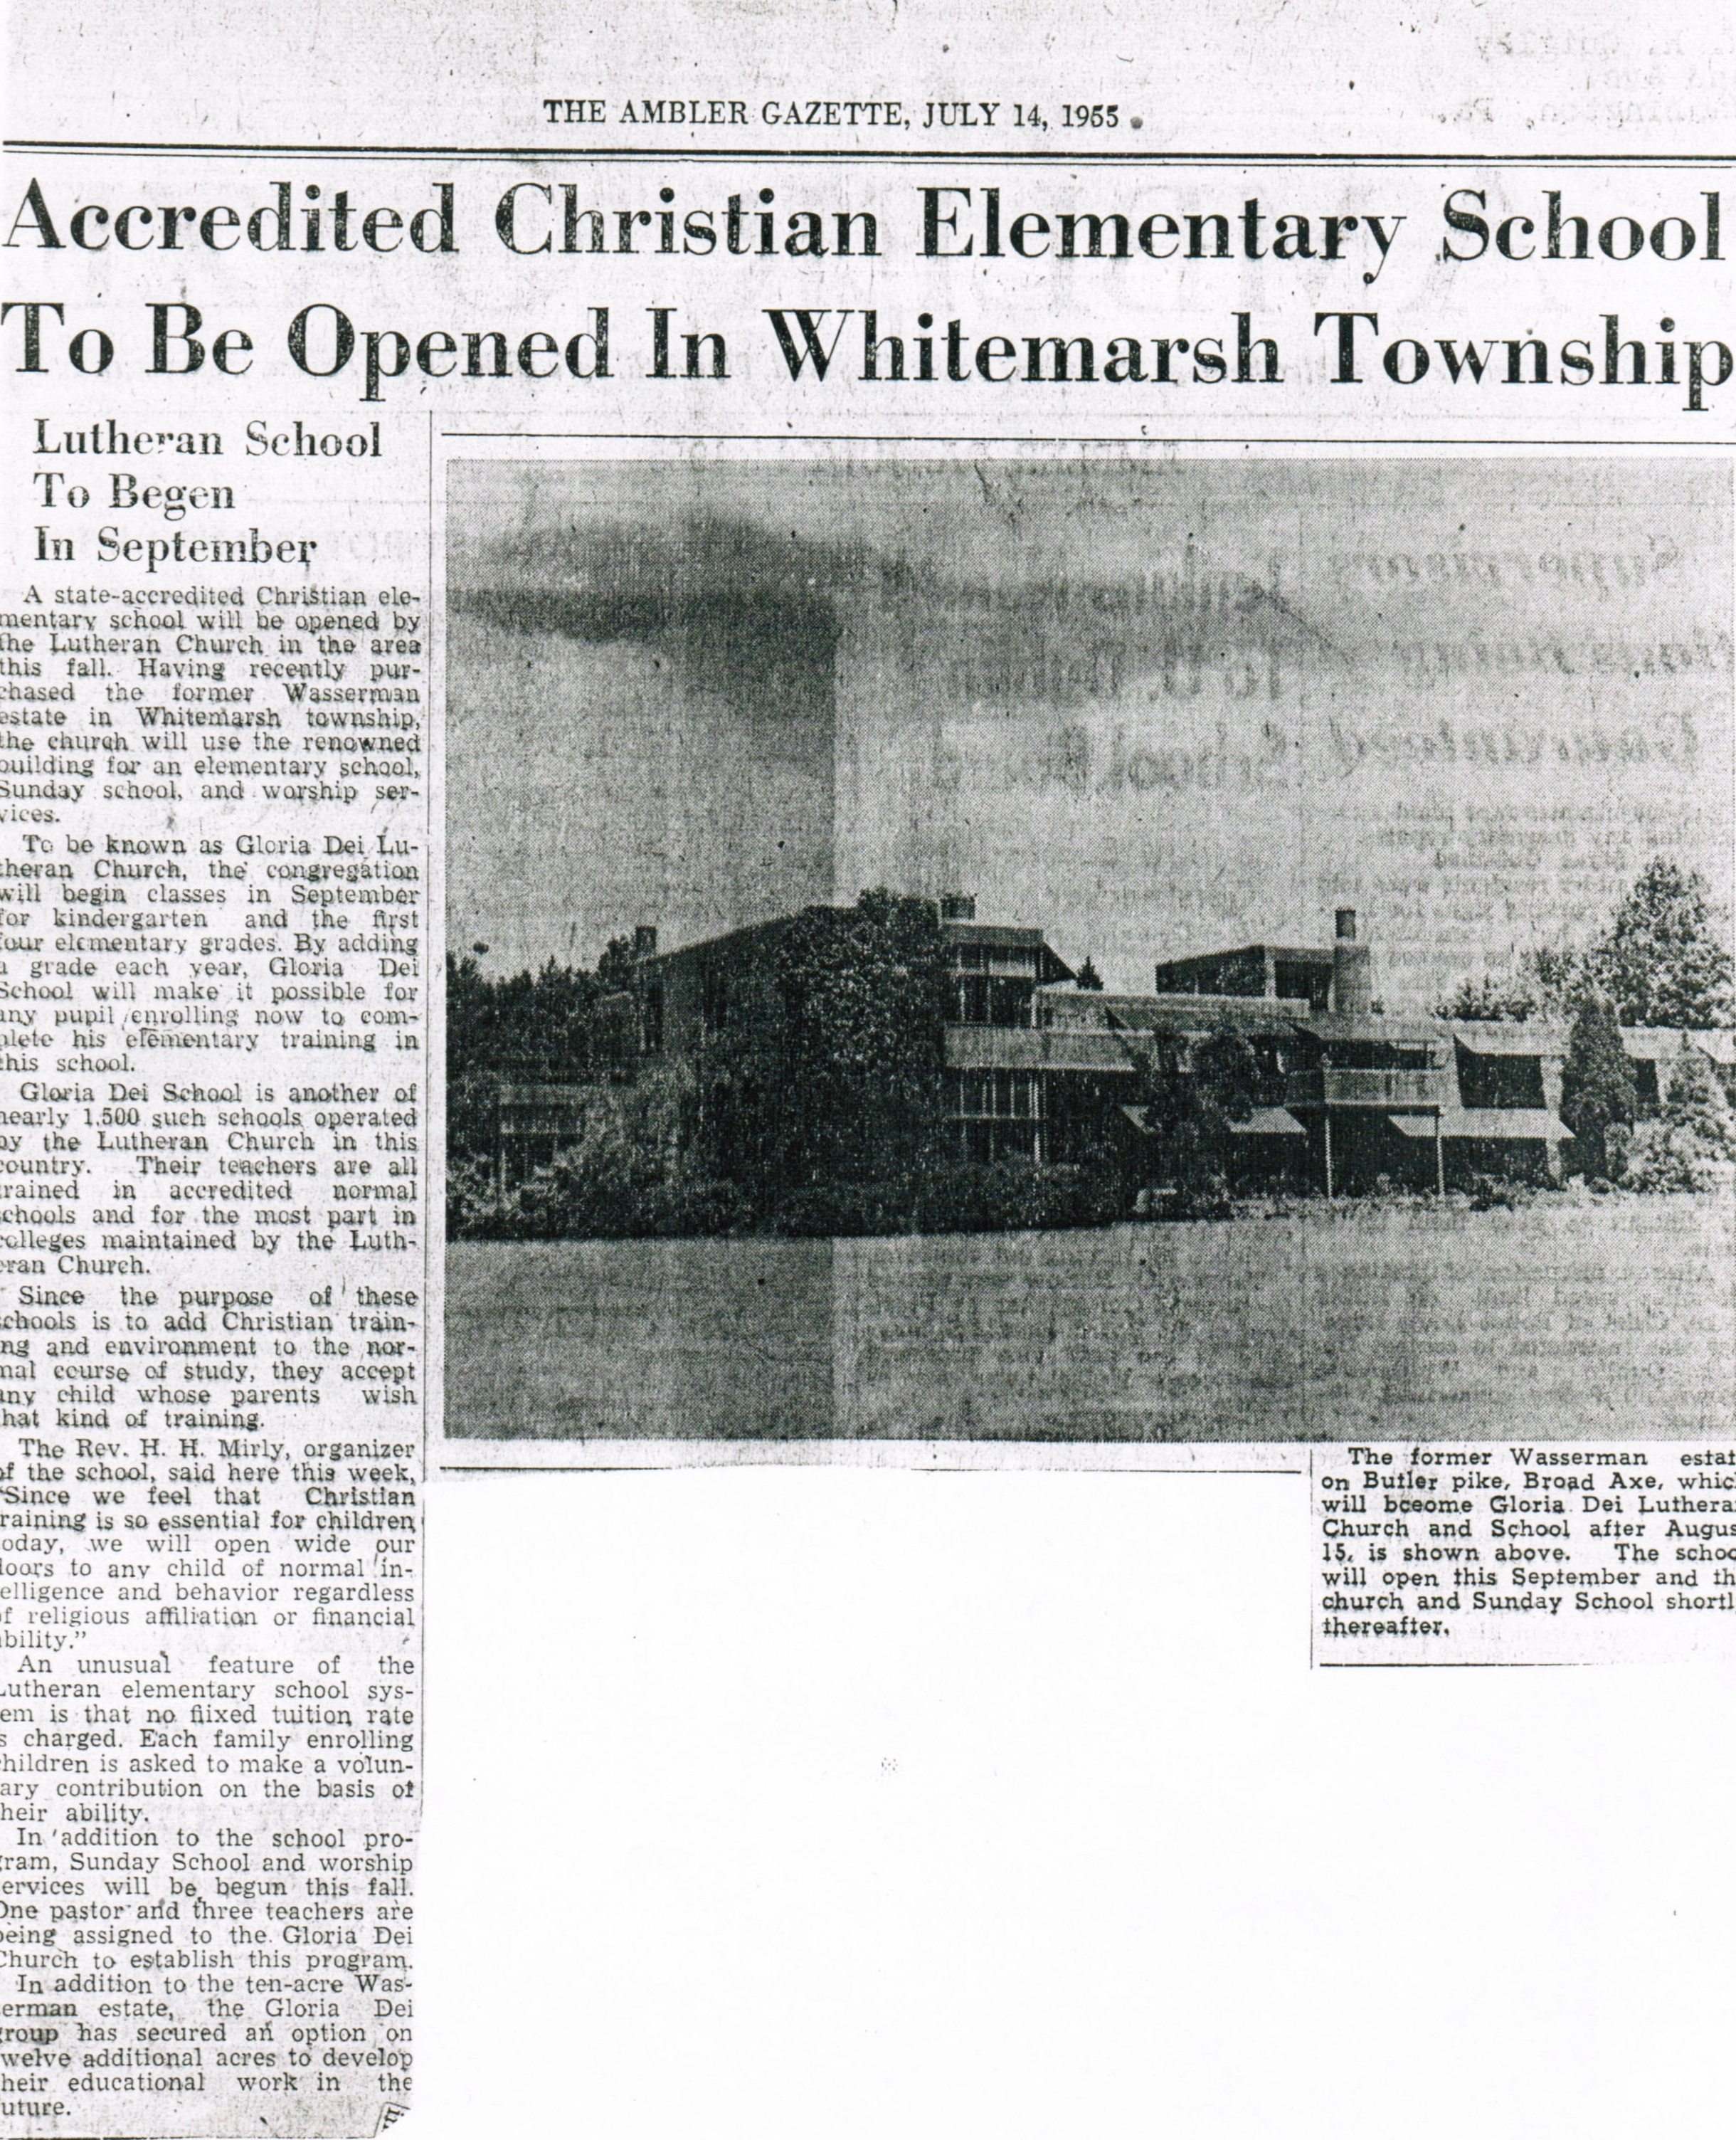 1955 Ambler Gazette Article (click to zoom)